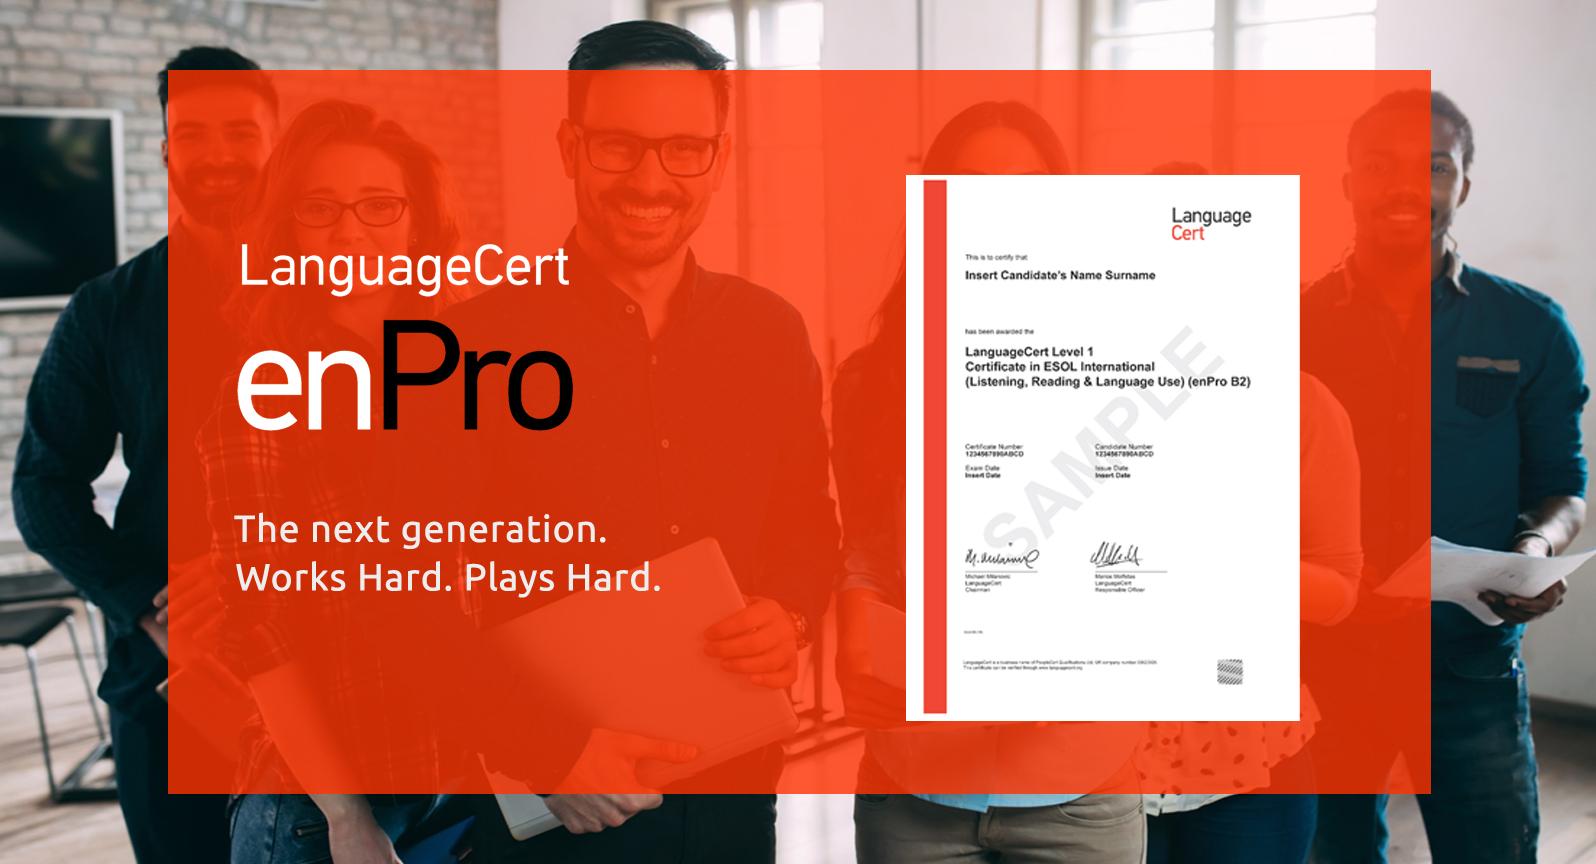 LanguageCert enPro header image